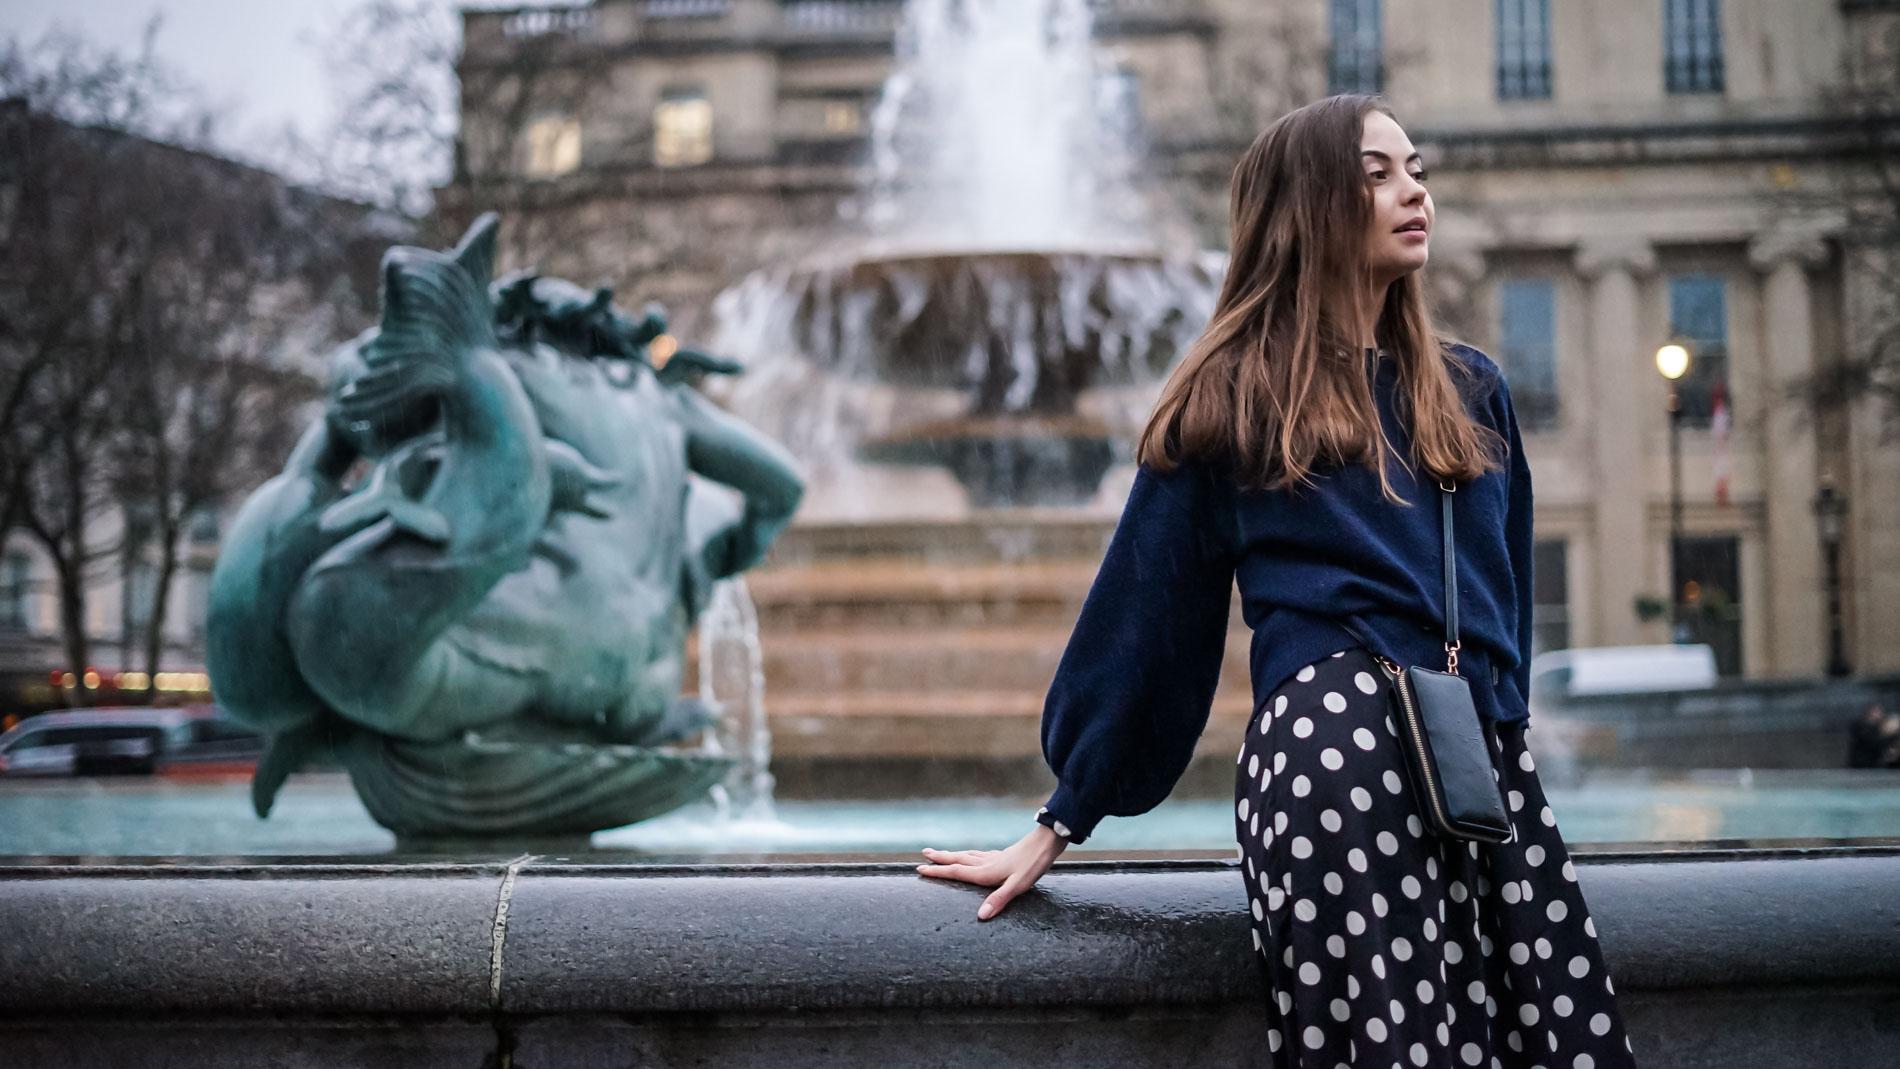 Portrait of Girl by Fountain London Trafalgar Square